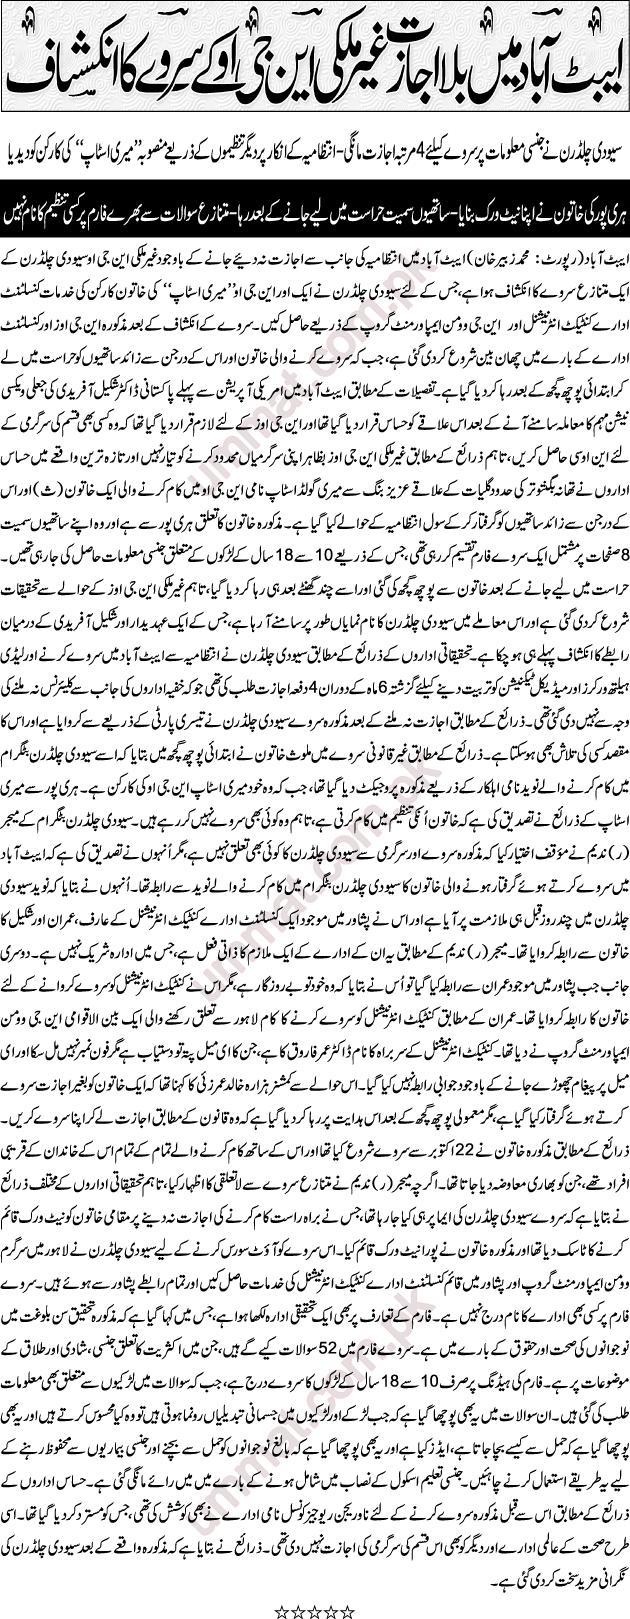 sex stories in pakistan jpg 1500x1000